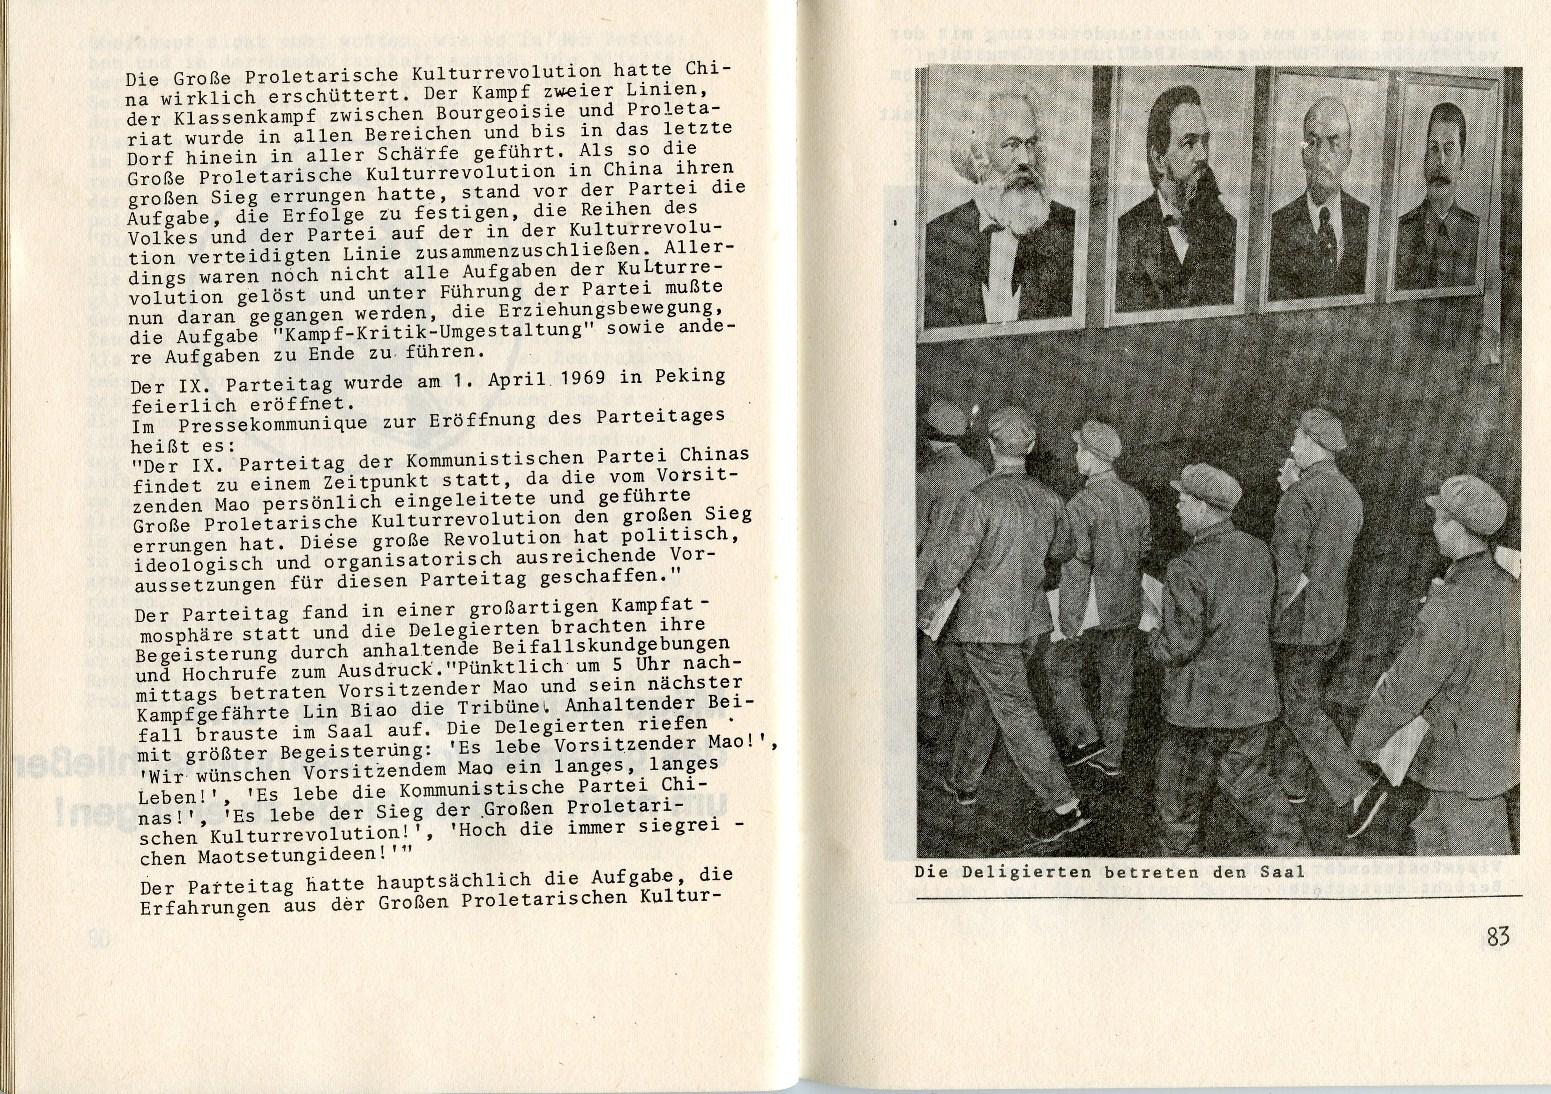 ZB_KPChinas_1971_43